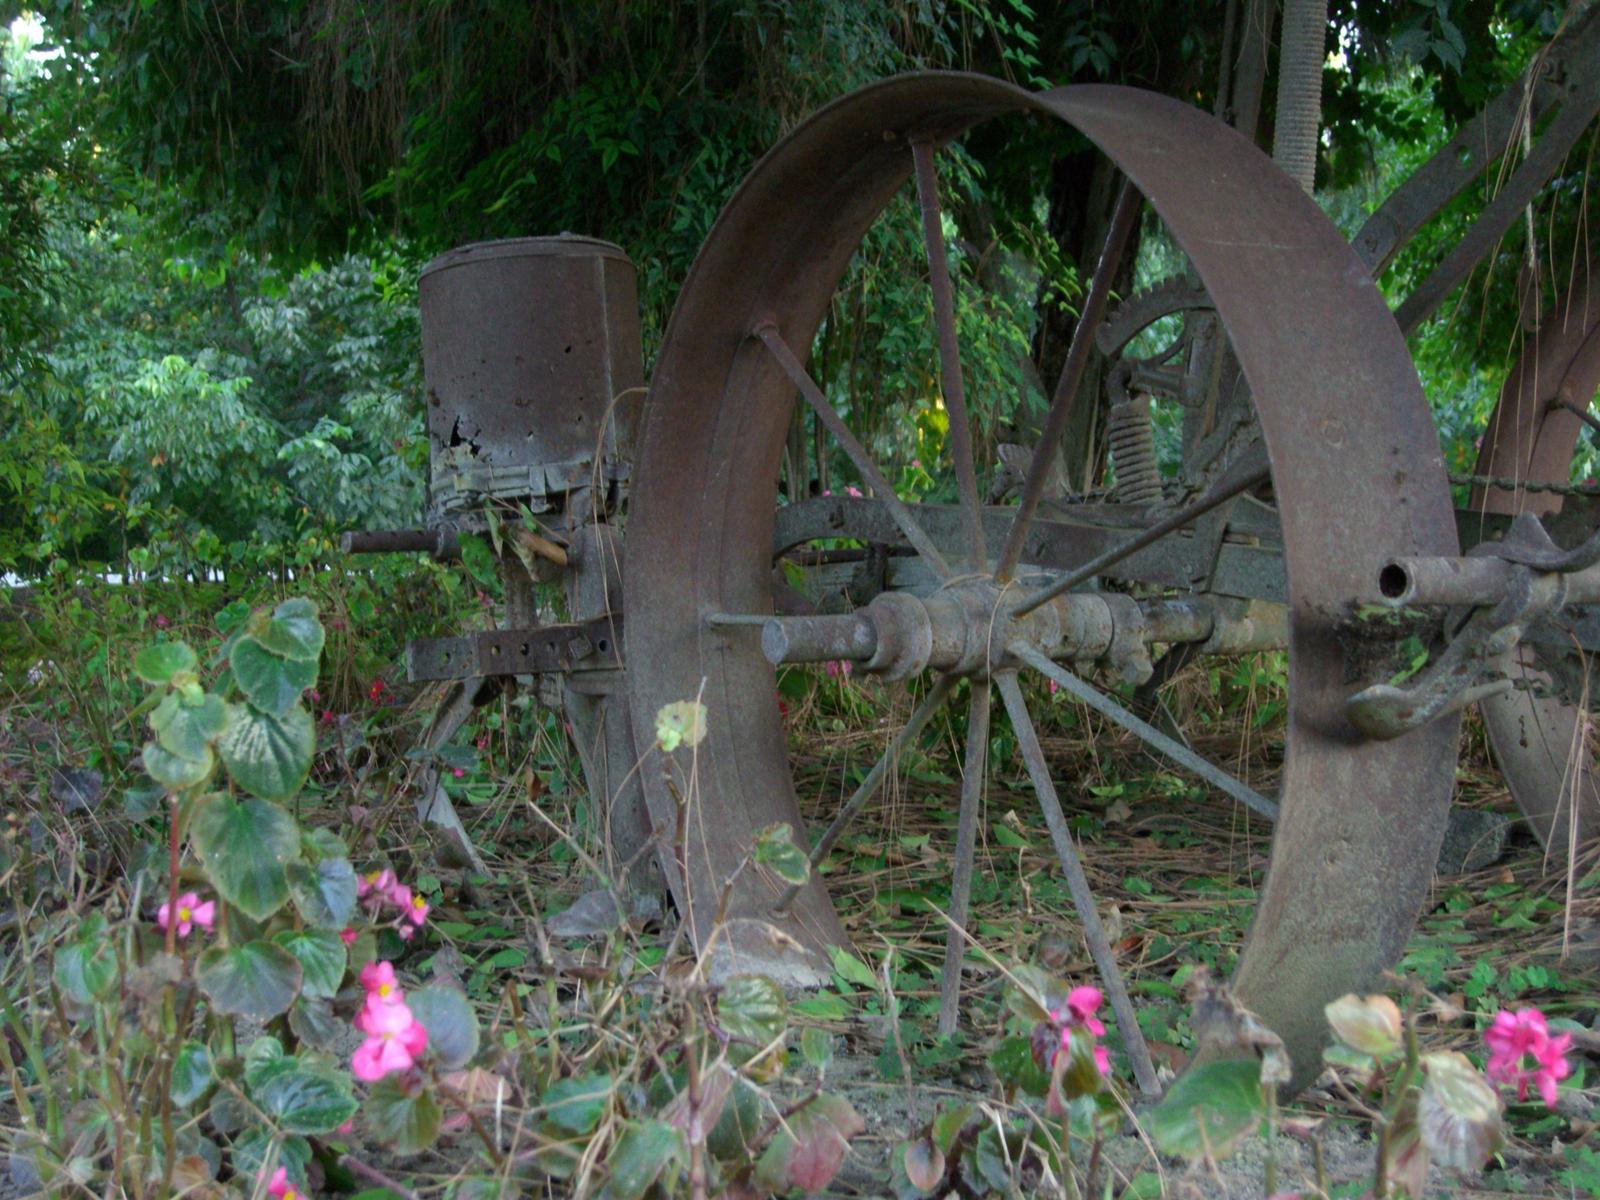 Antiquated Farm Equipment, Antique, Bspo06, Equipment, Farm, HQ Photo